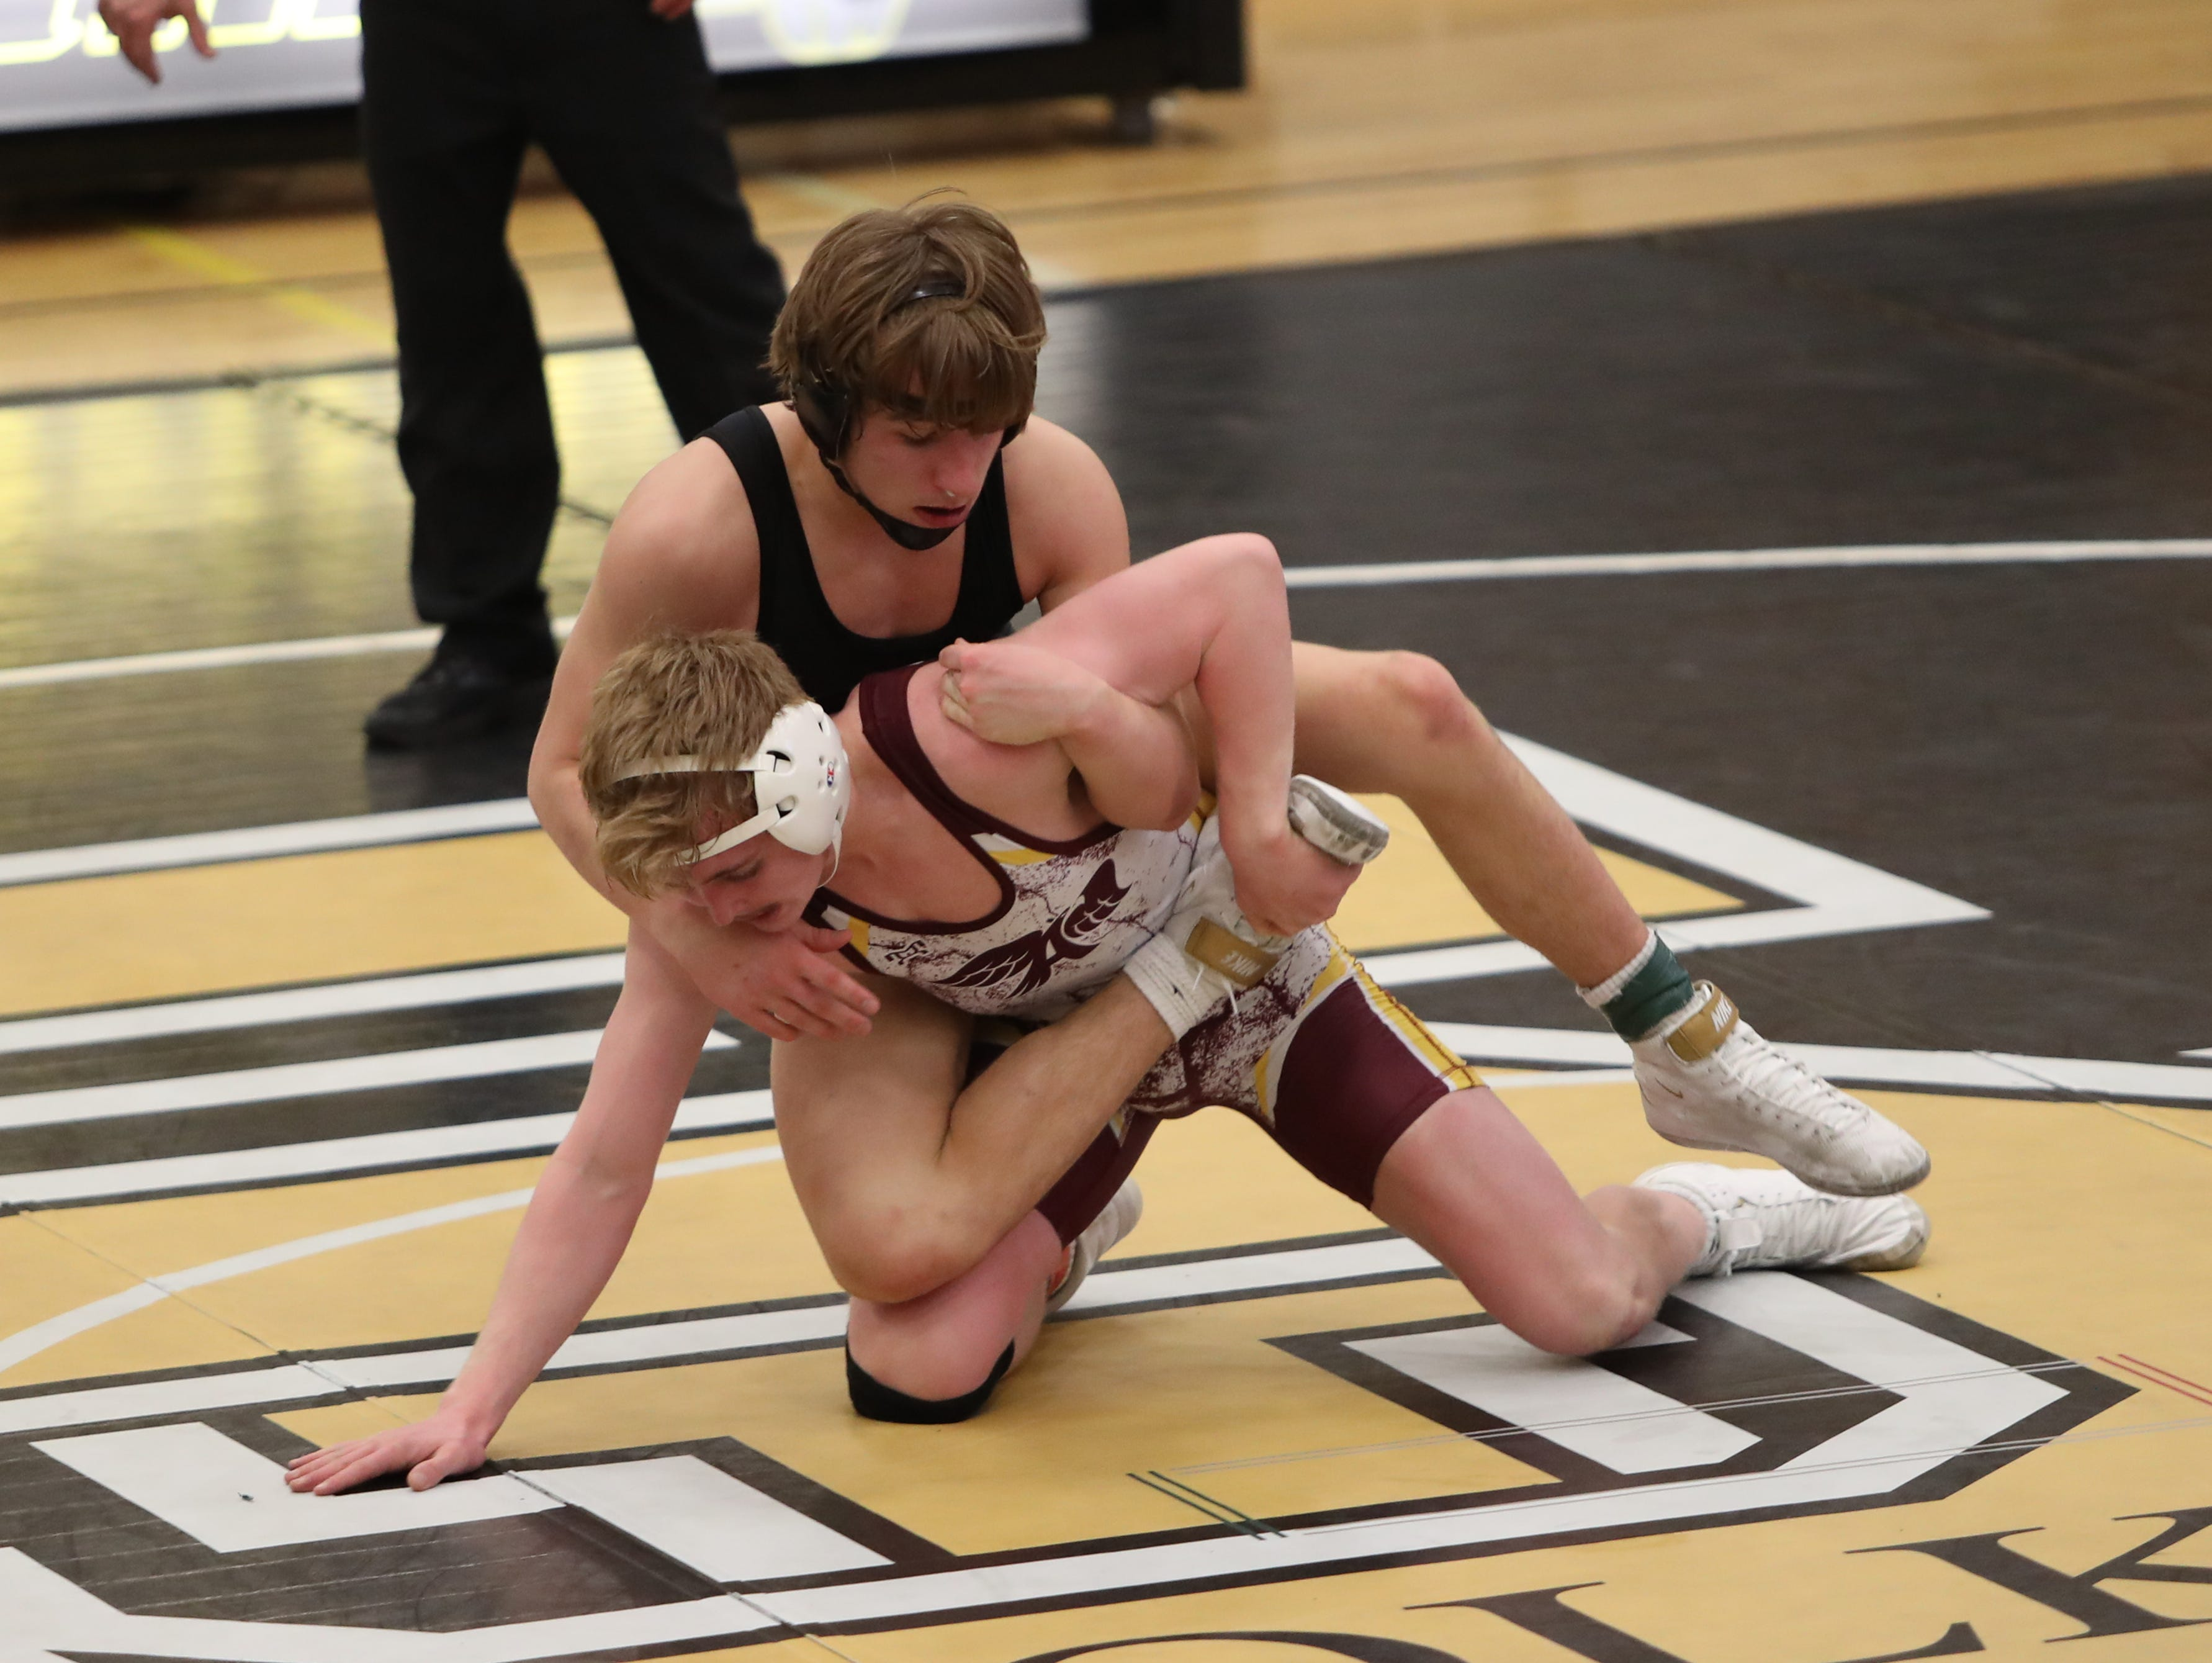 Southeast Polk's Carson Martinson controls Ankeny's Sam Kallem in a 132-pound match. Martinson won a 6-4 decision. Southeast Polk defeated Ankeny 57-17 in a Class 3A regional dual Feb. 6 at Southeast Polk.